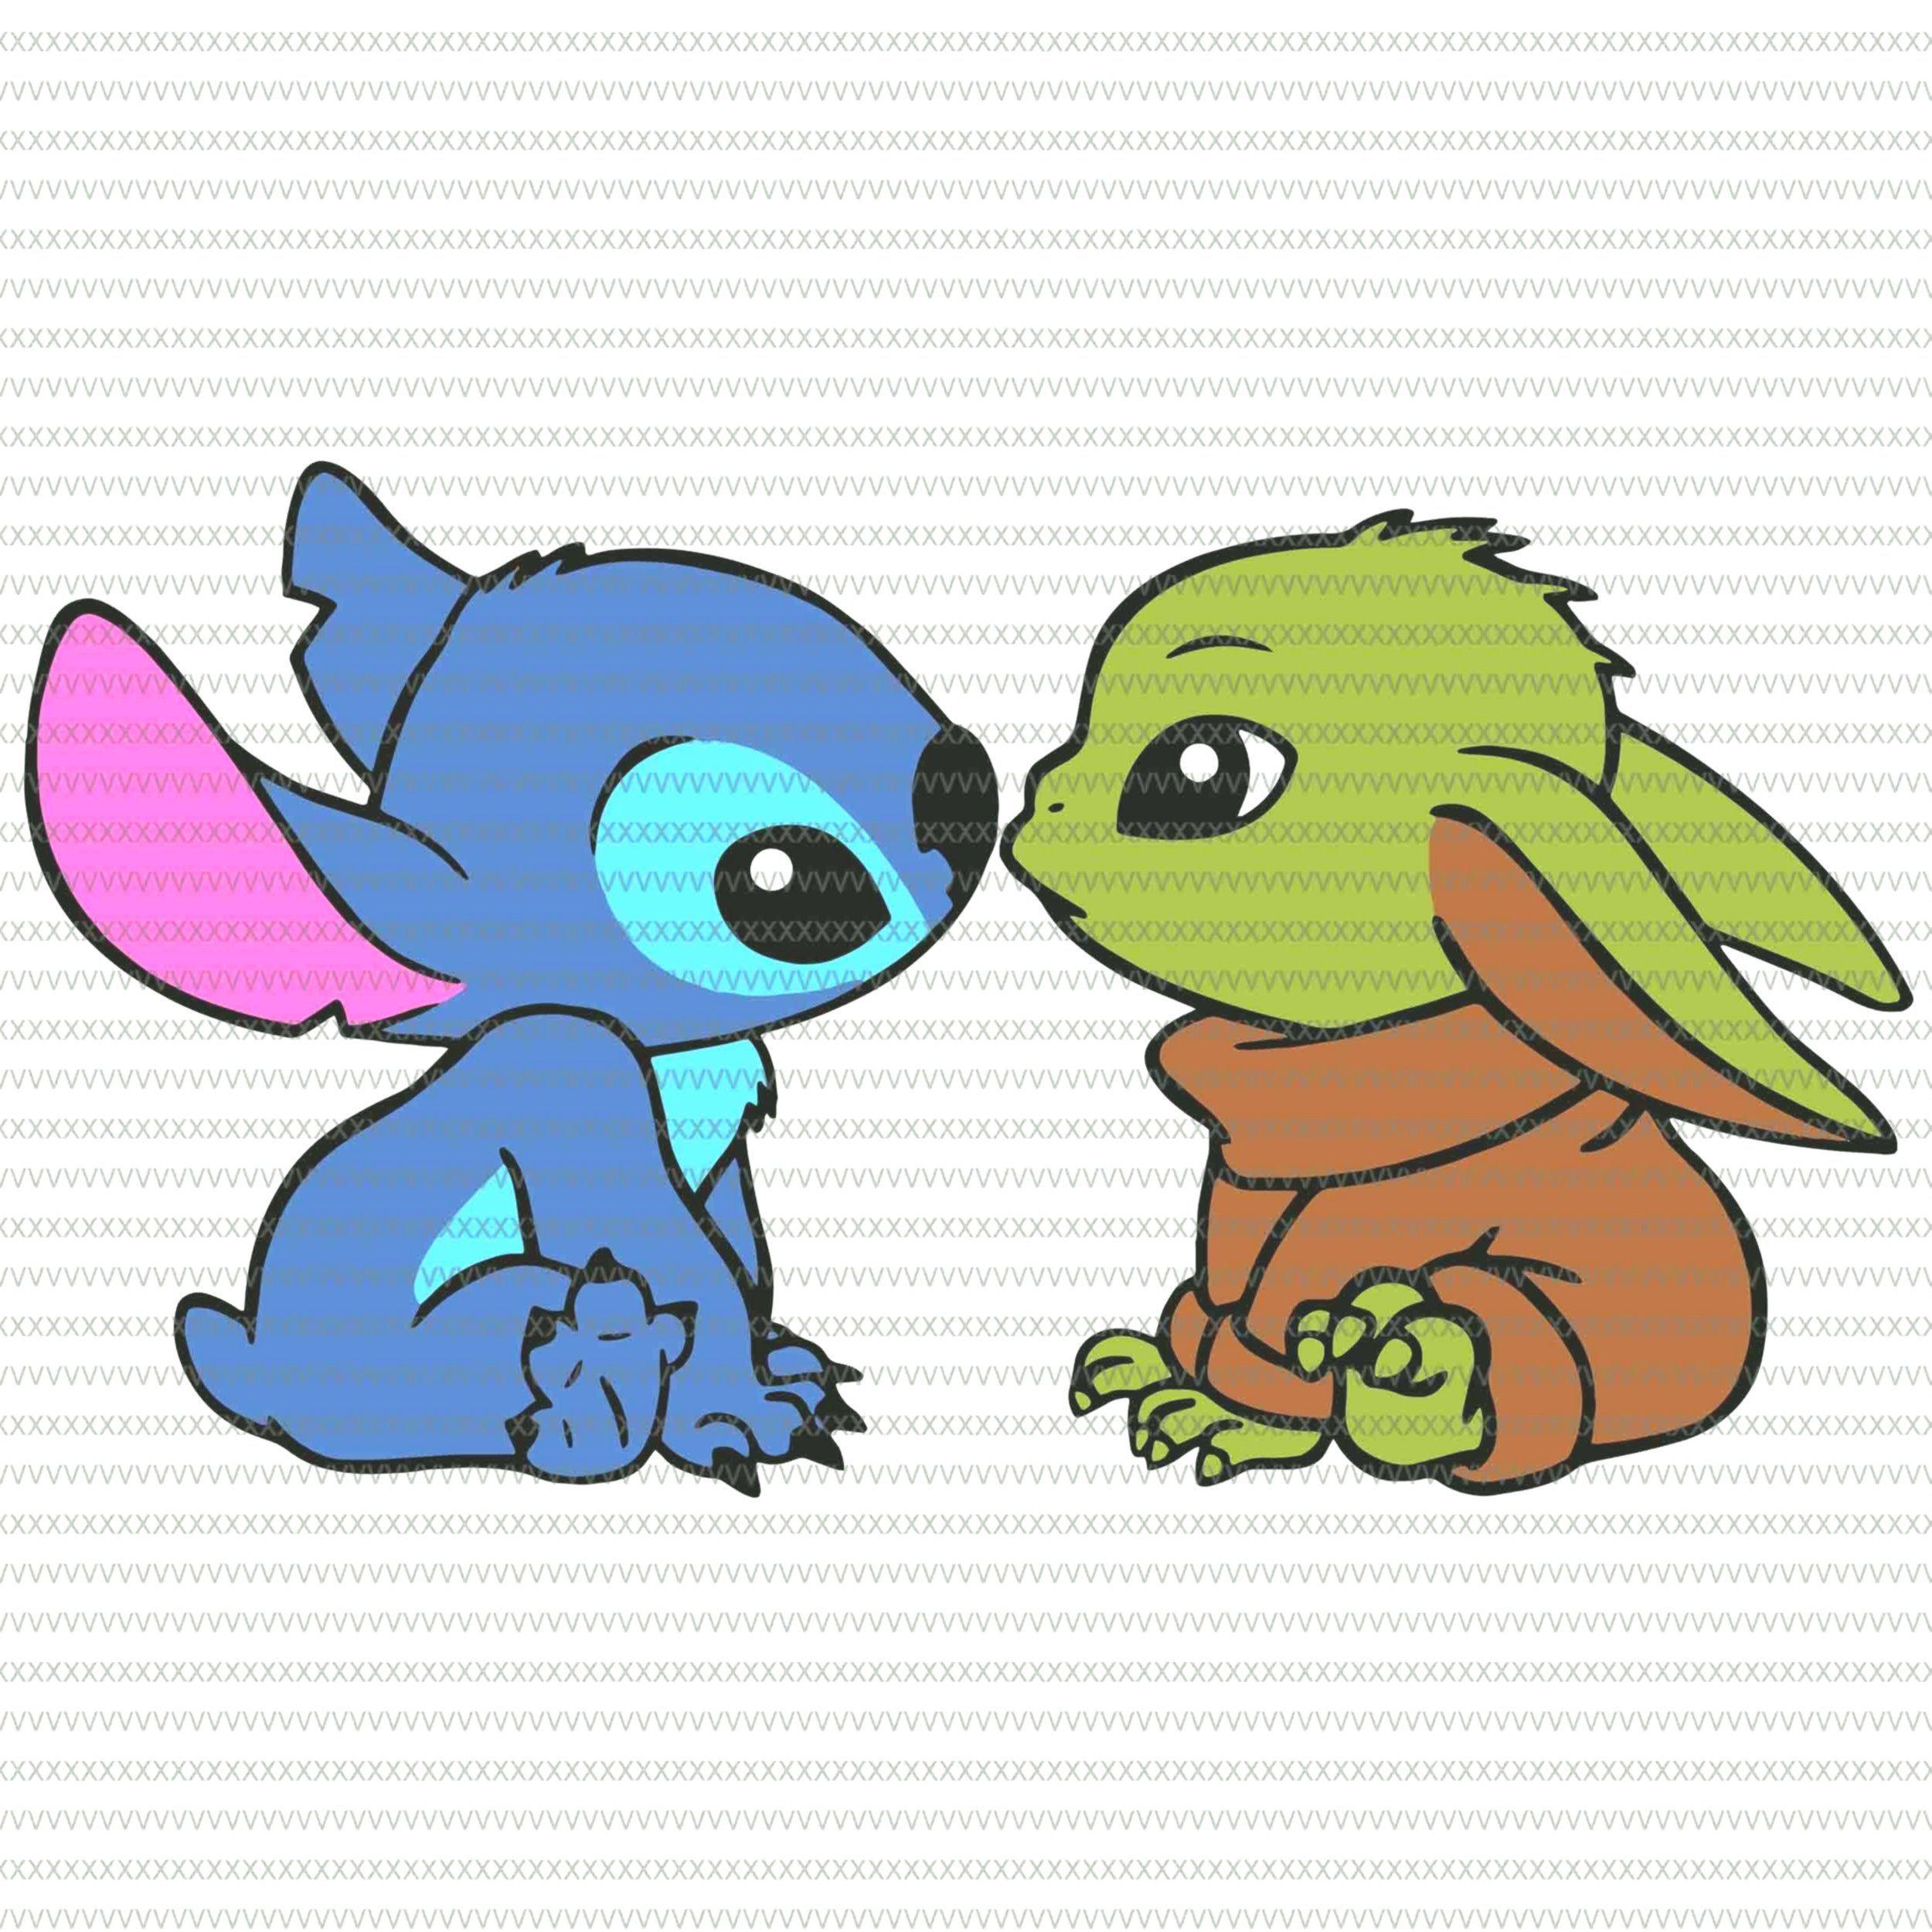 Baby Yoda And Stitch Pngbaby Yoda Pngbaby Yoda The Mandalorian Star Warsbaby Yoda The Mandalorian S Cute Cartoon Drawings Cute Cartoon Wallpapers Cute Cartoon